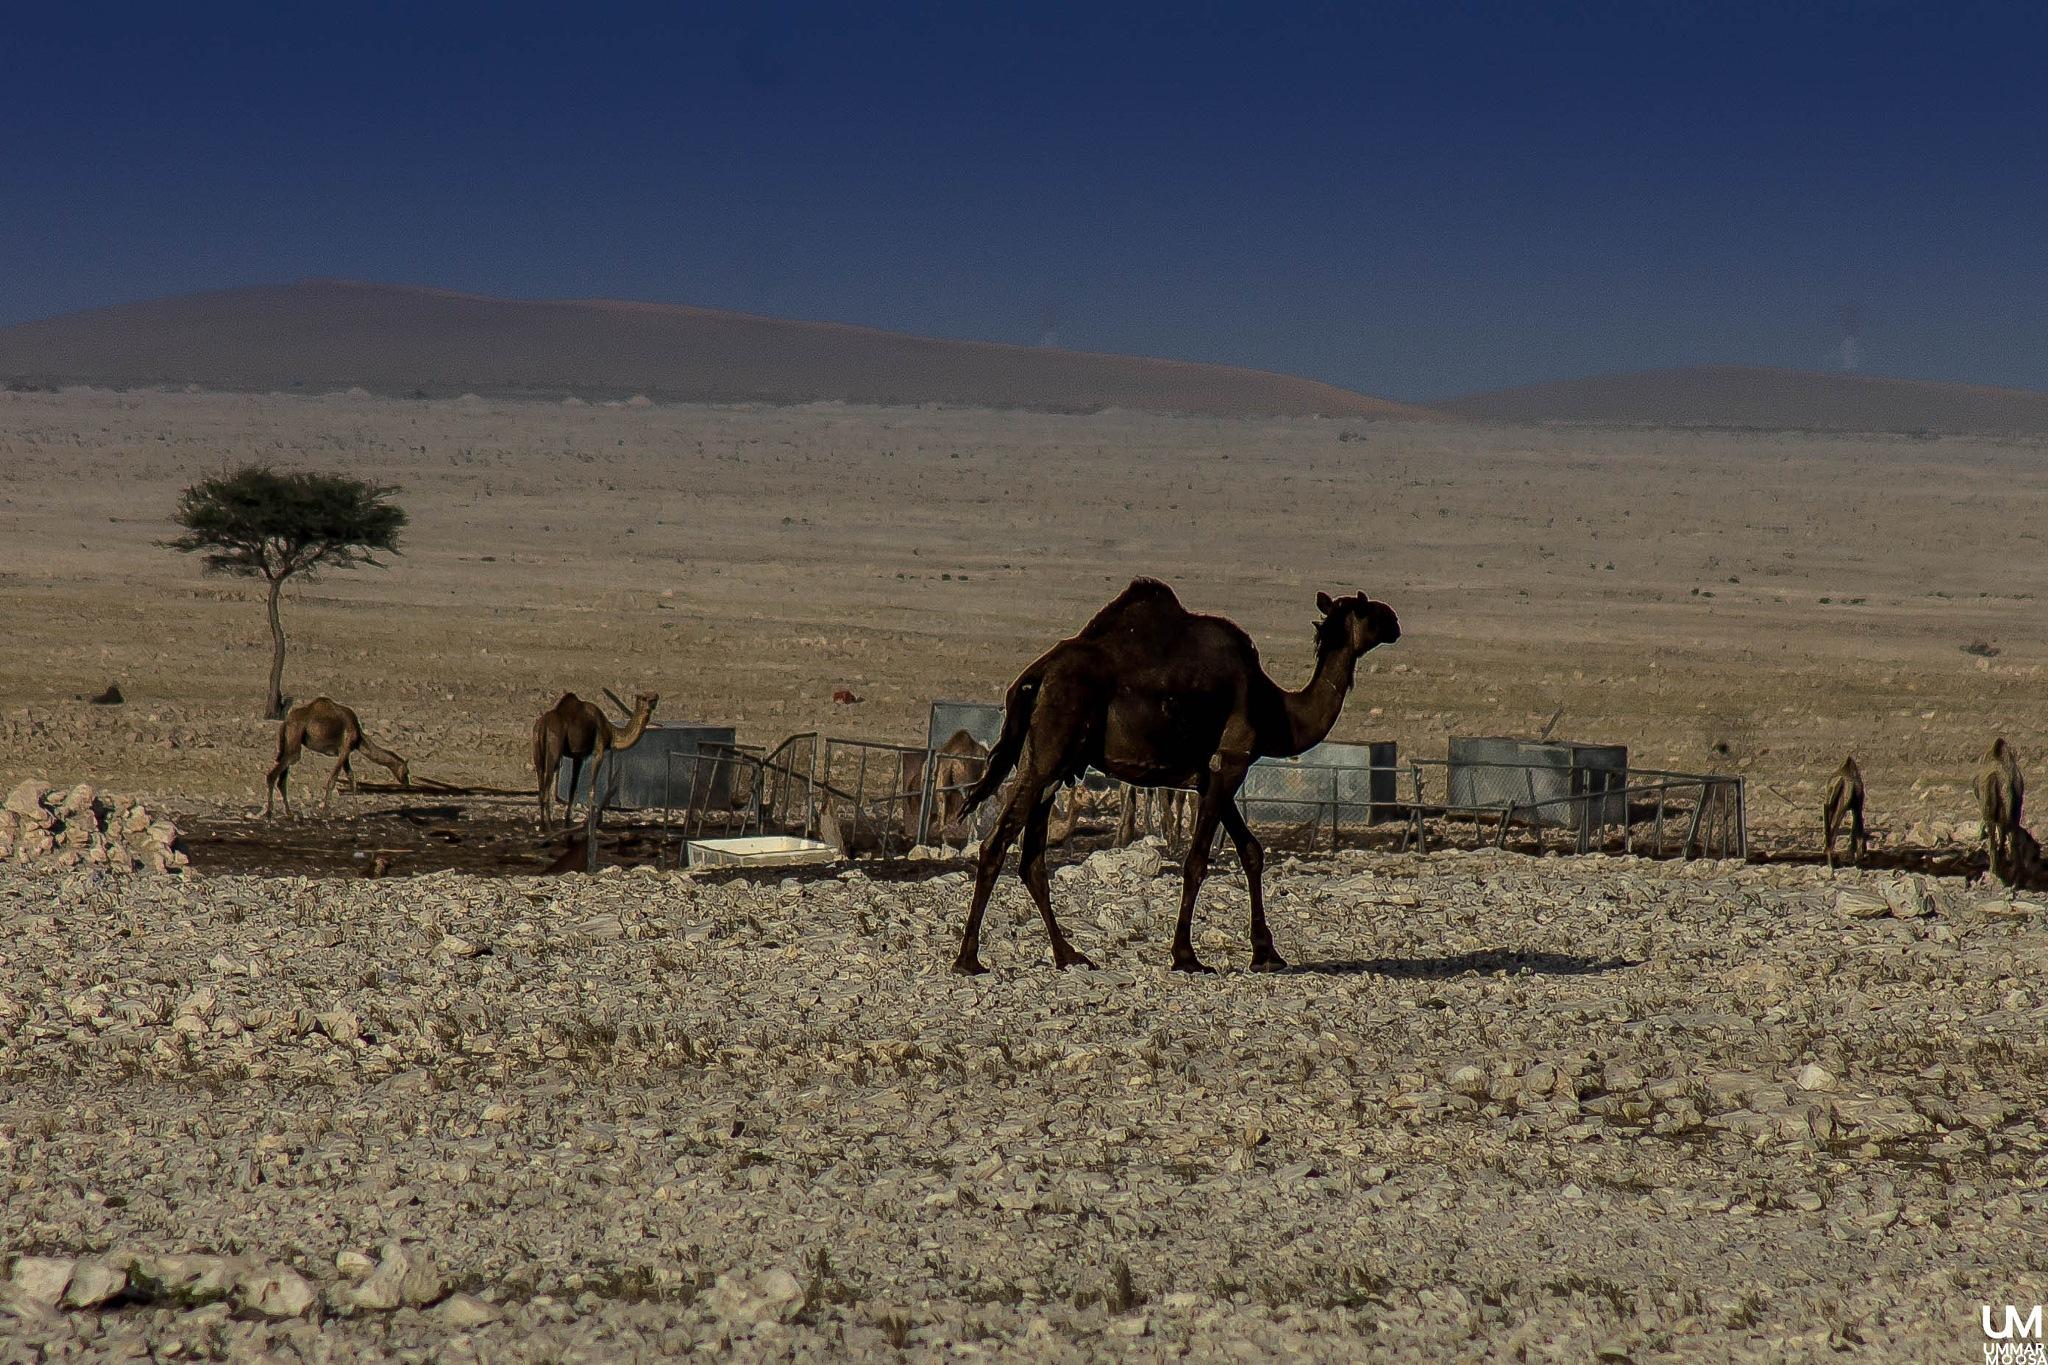 A Camel in desert by Ummar Moosa